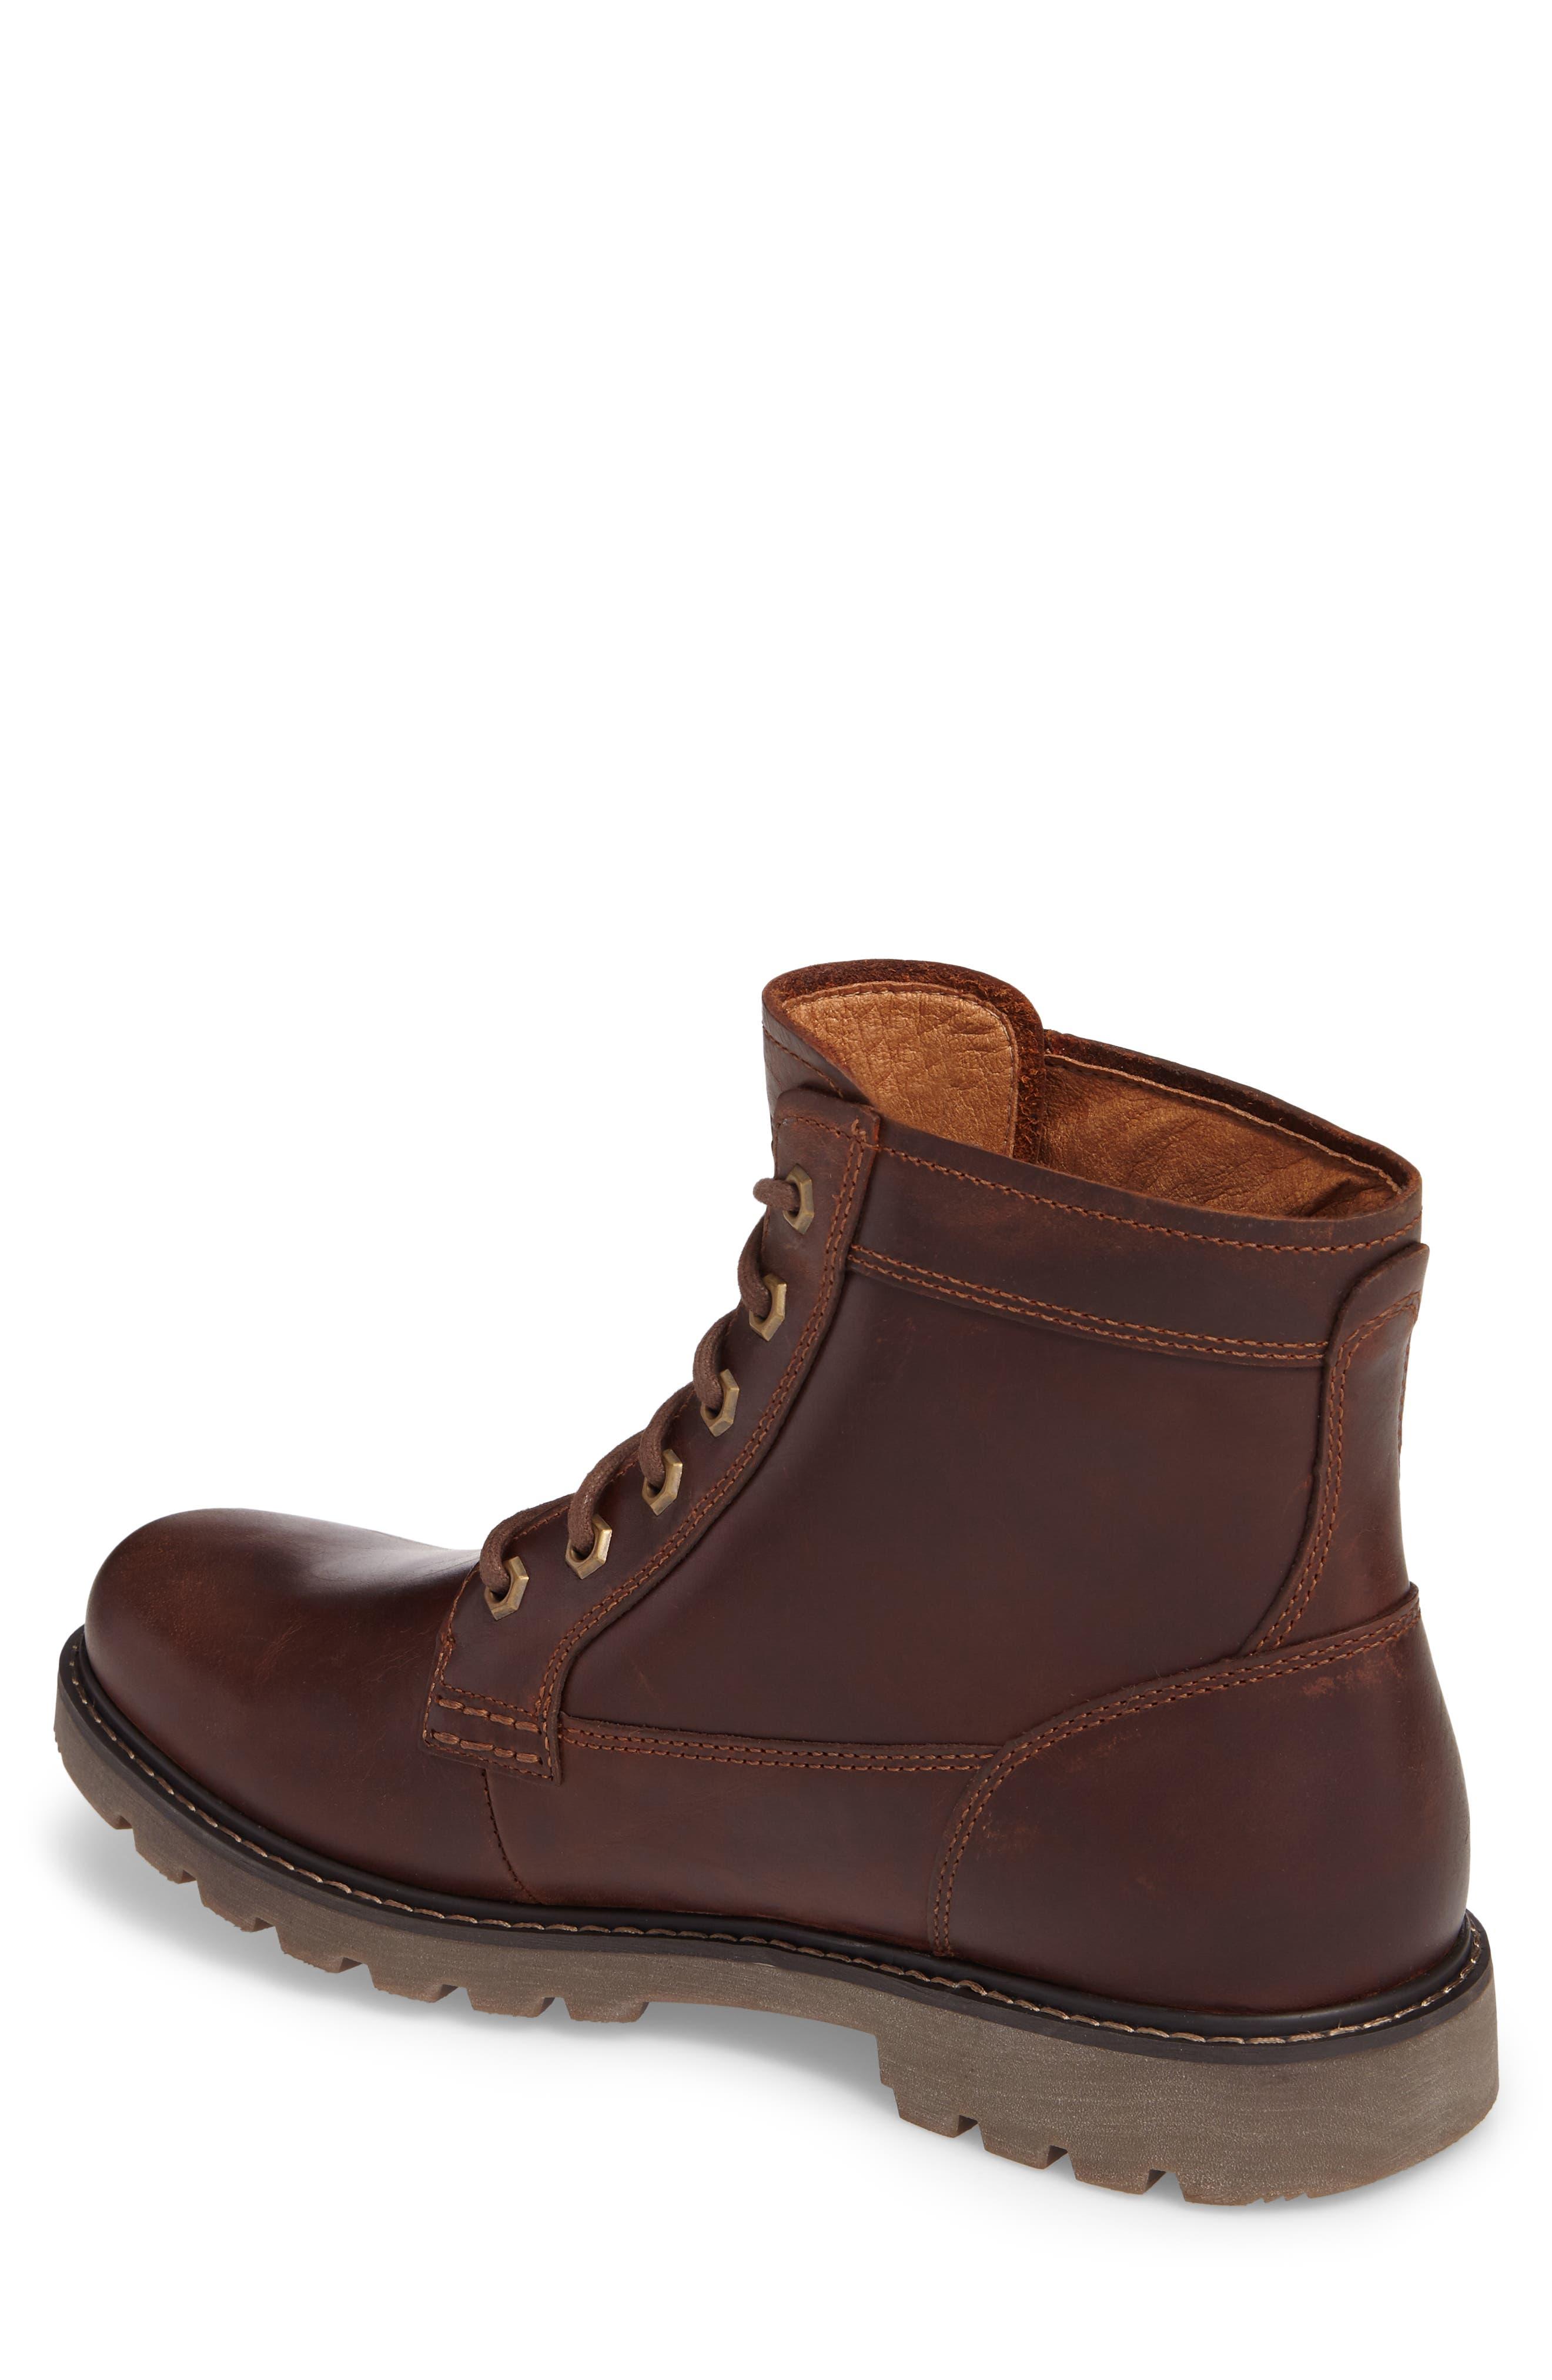 DUNHAM, Royalton Plain Toe Boot, Alternate thumbnail 2, color, BROWN